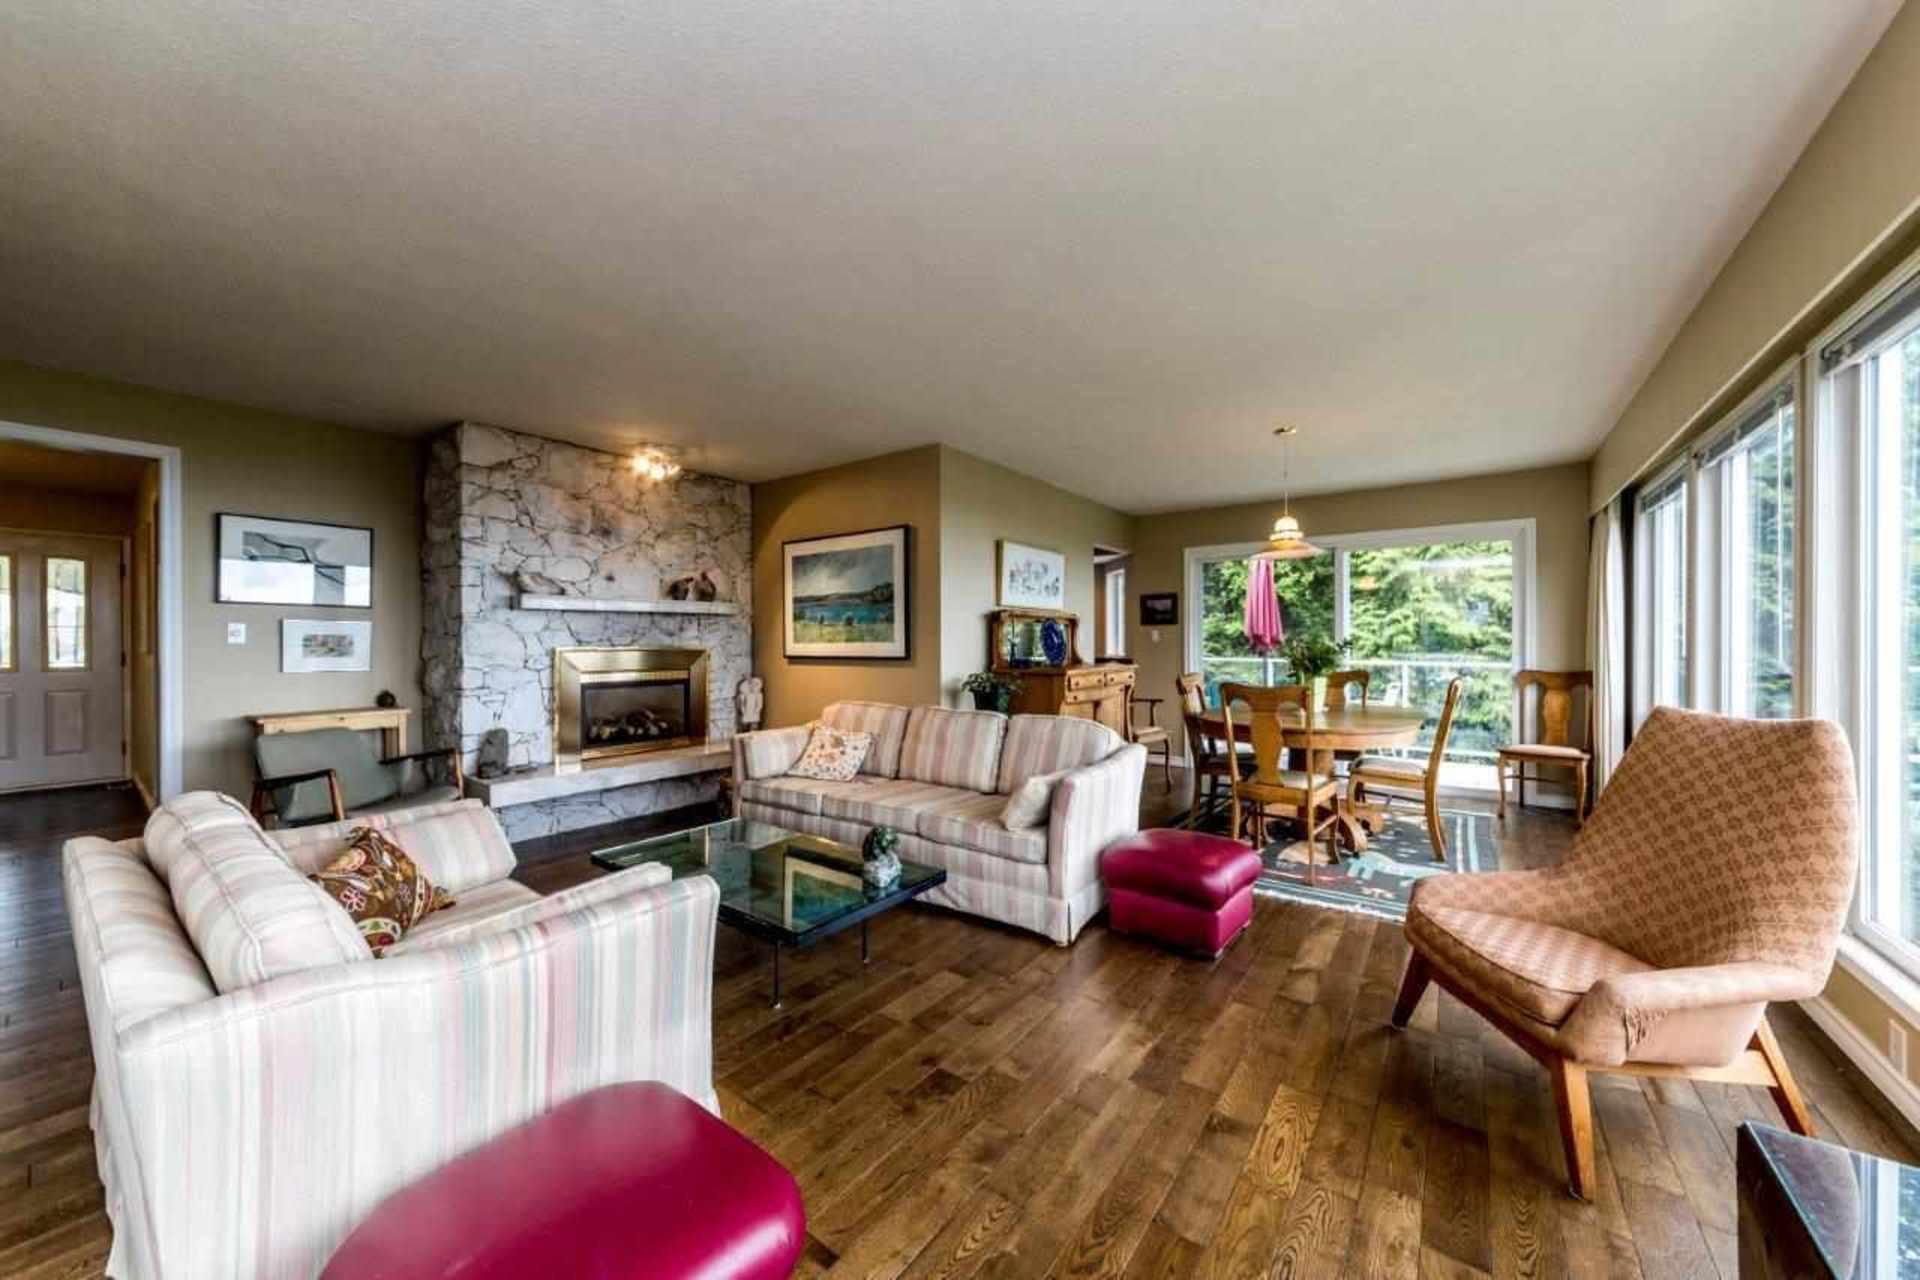 3863-st-pauls-avenue-upper-lonsdale-north-vancouver-10 at 3863 St. Pauls Avenue, Upper Lonsdale, North Vancouver